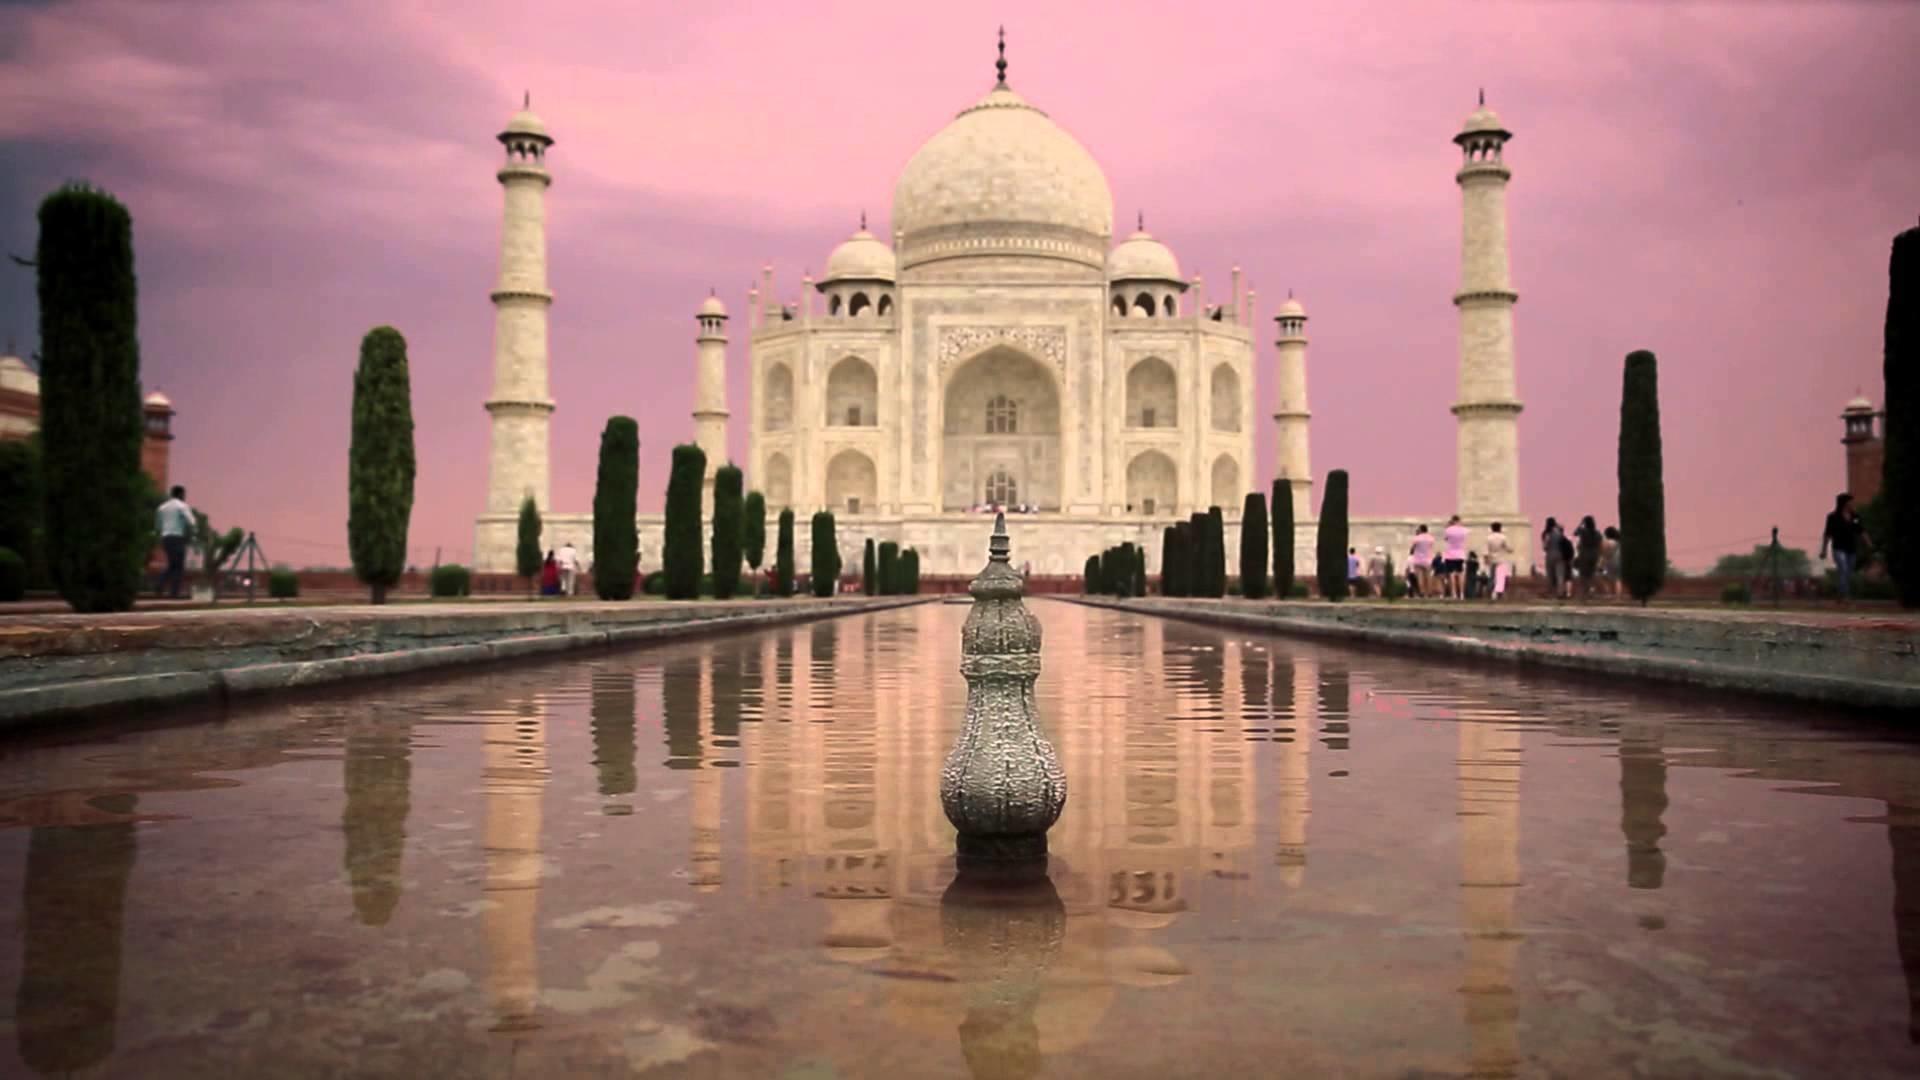 Taj mahal wallpaper wallpapertag - Taj mahal background hd ...